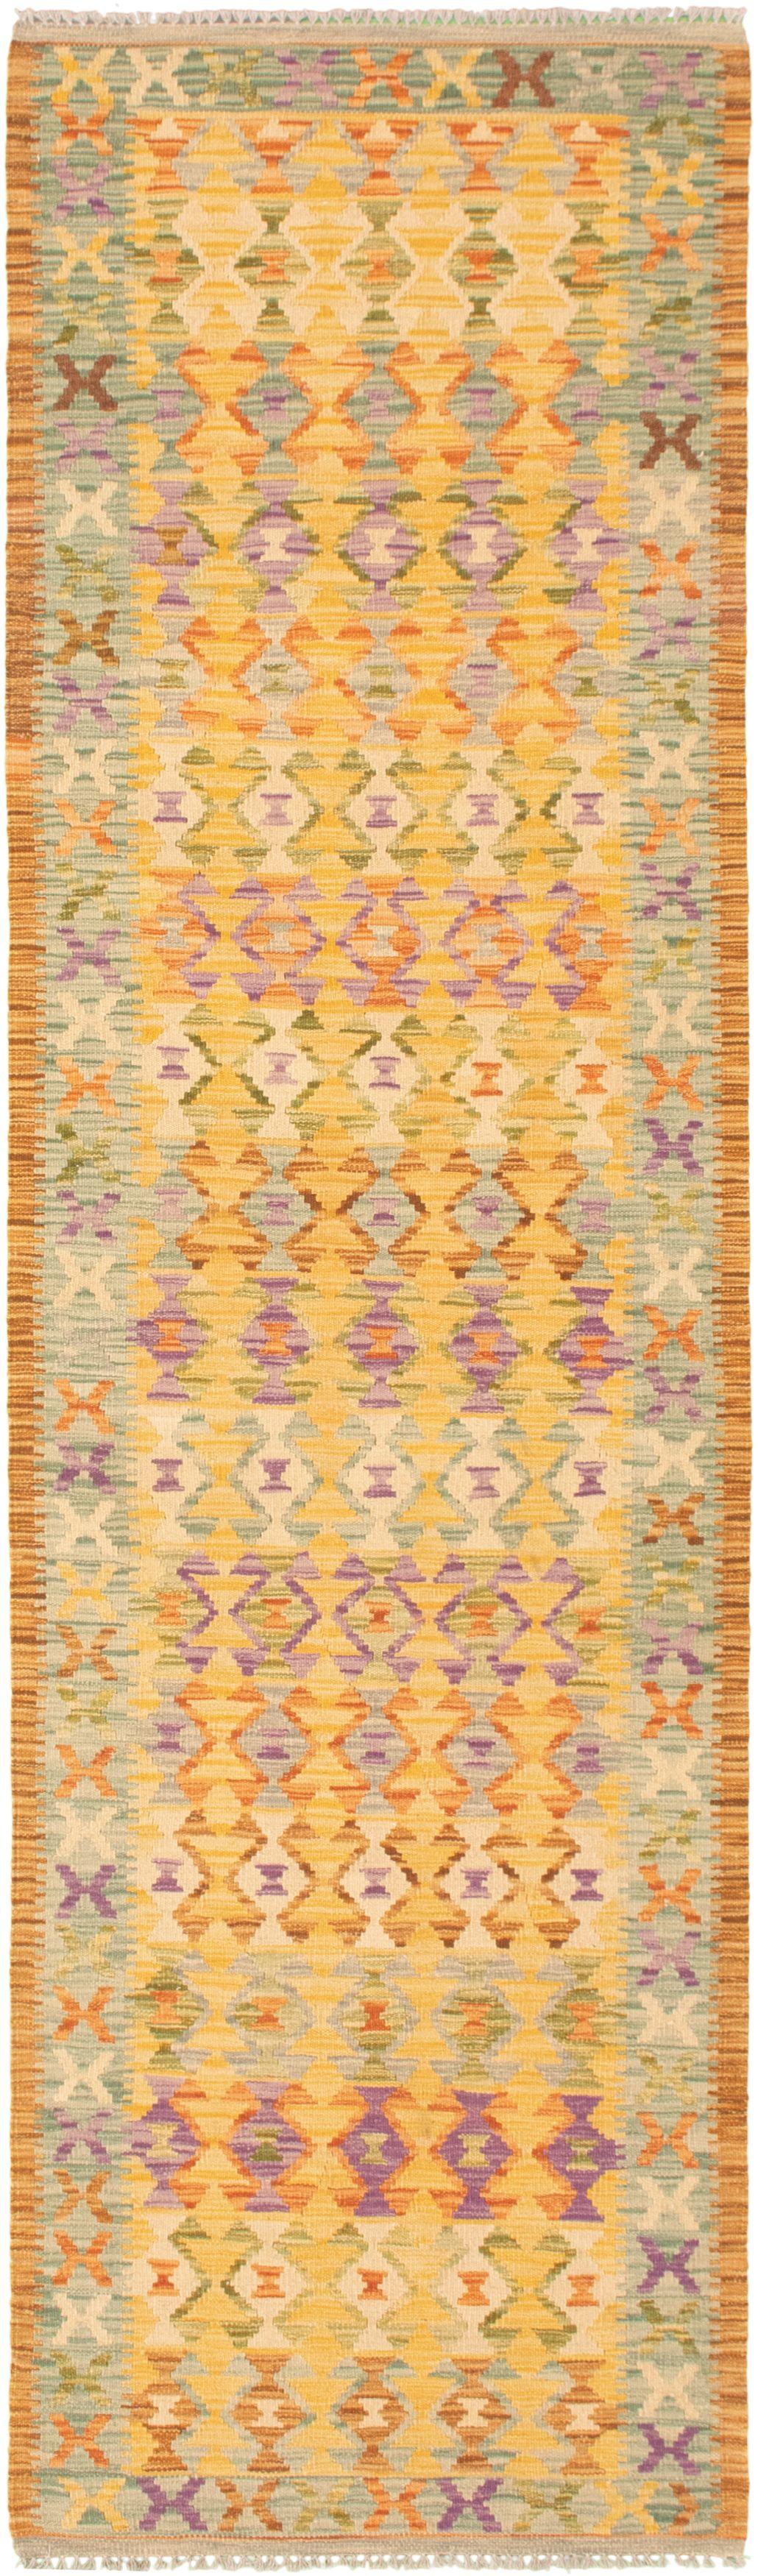 "Hand woven Bold and Colorful  Light Orange  Kilim 2'9"" x 9'11"" Size: 2'9"" x 9'11"""